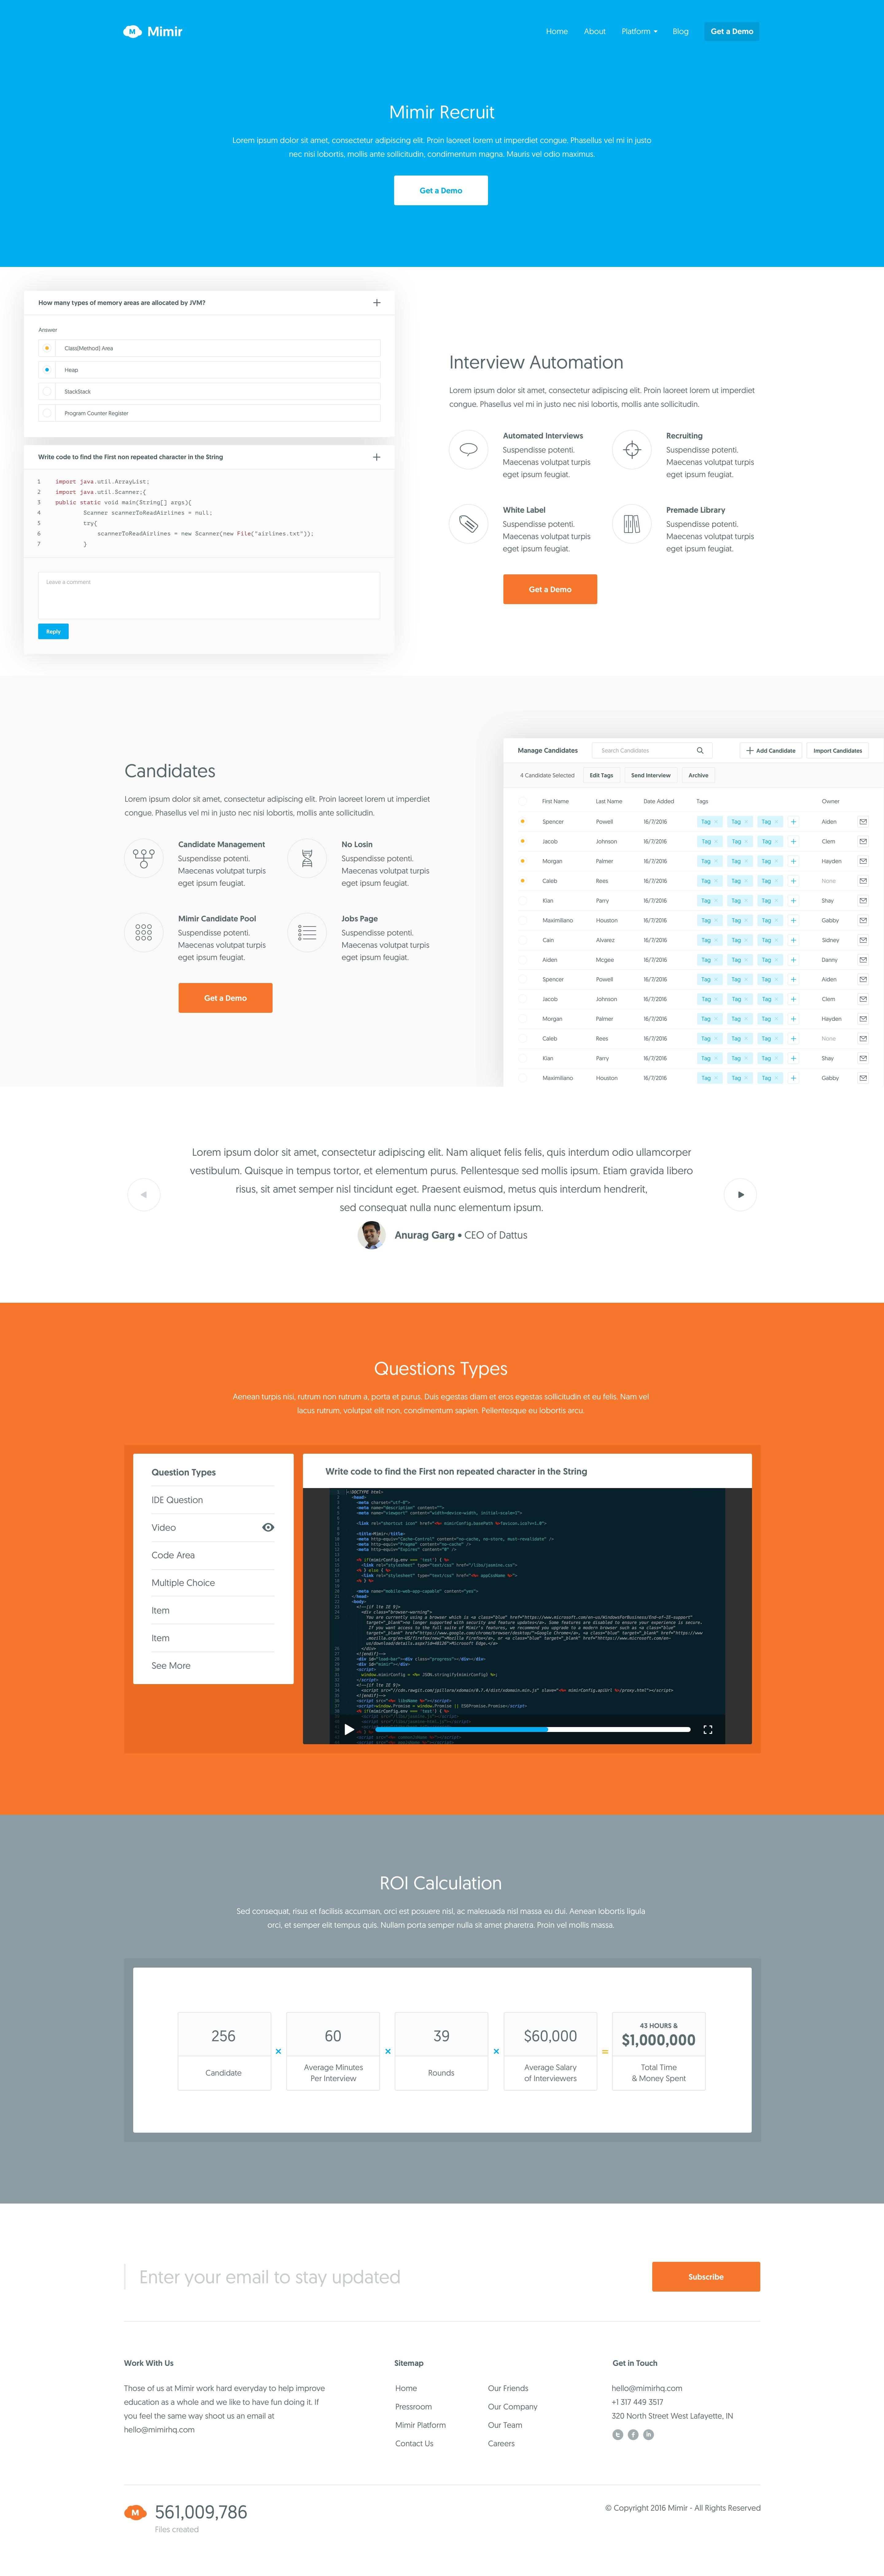 Mimir website mimirrecruit v2 2x